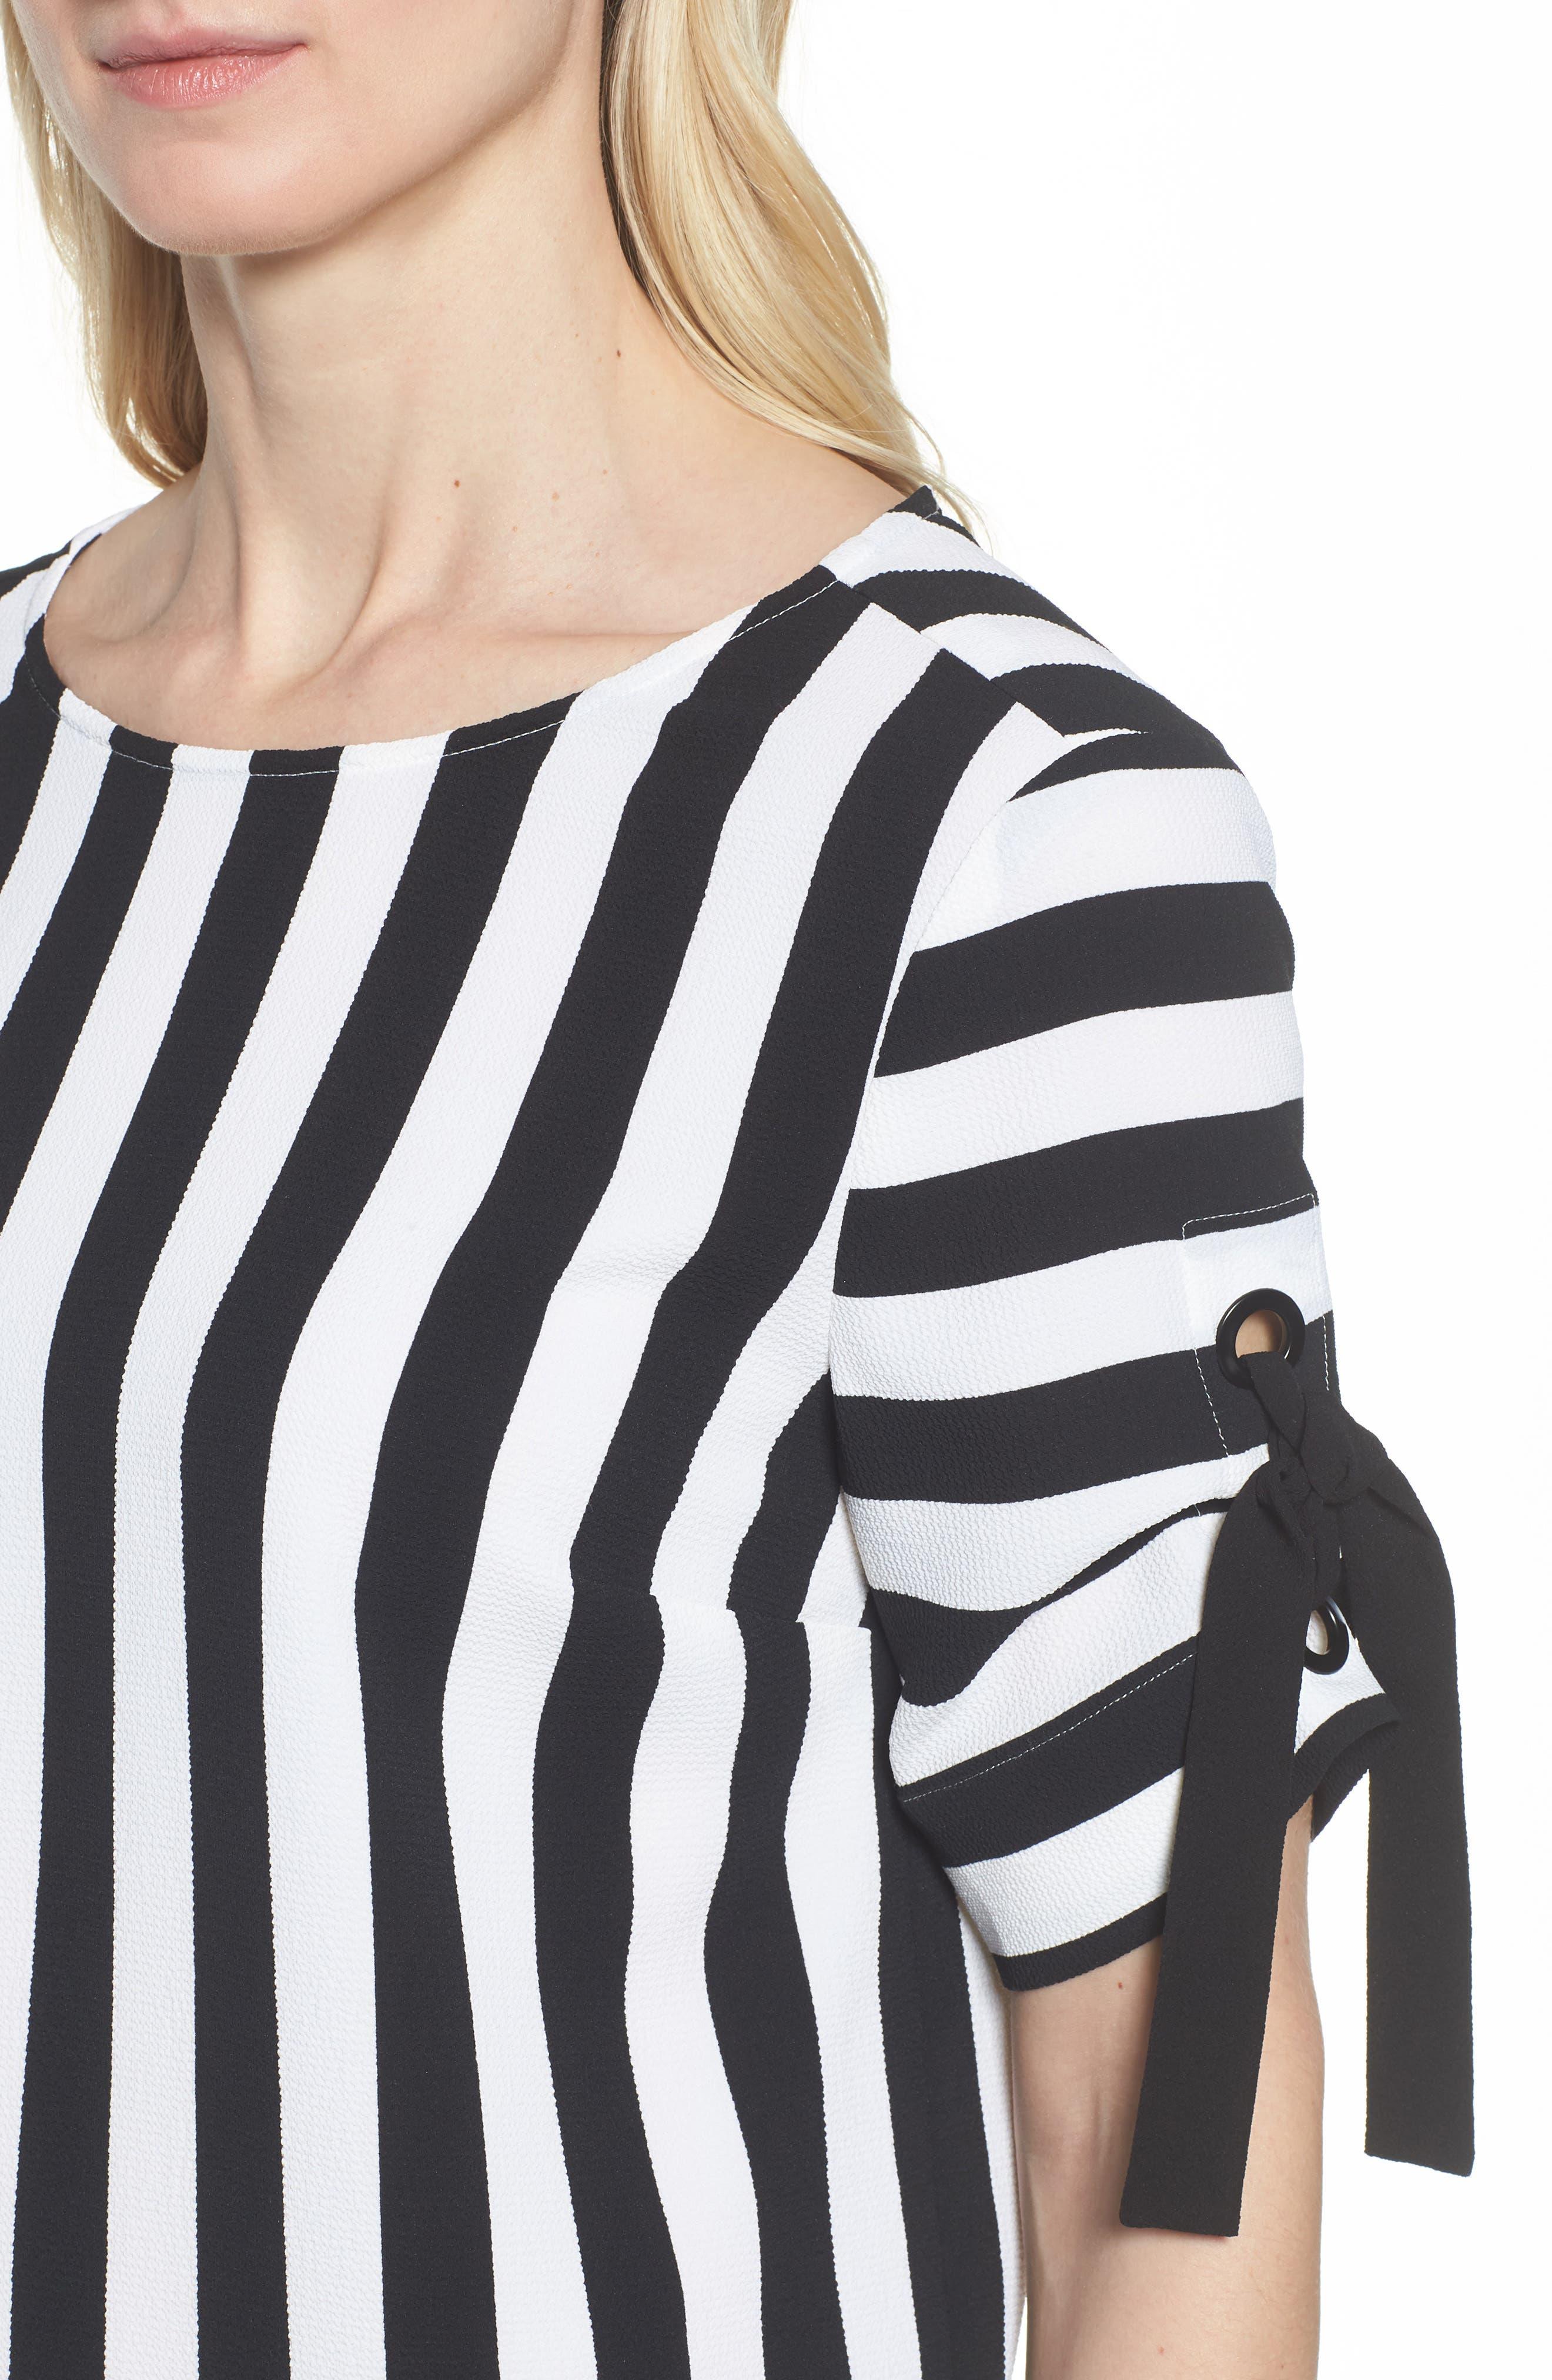 Spectator Stripe Tie Cuff Blouse,                             Alternate thumbnail 4, color,                             006